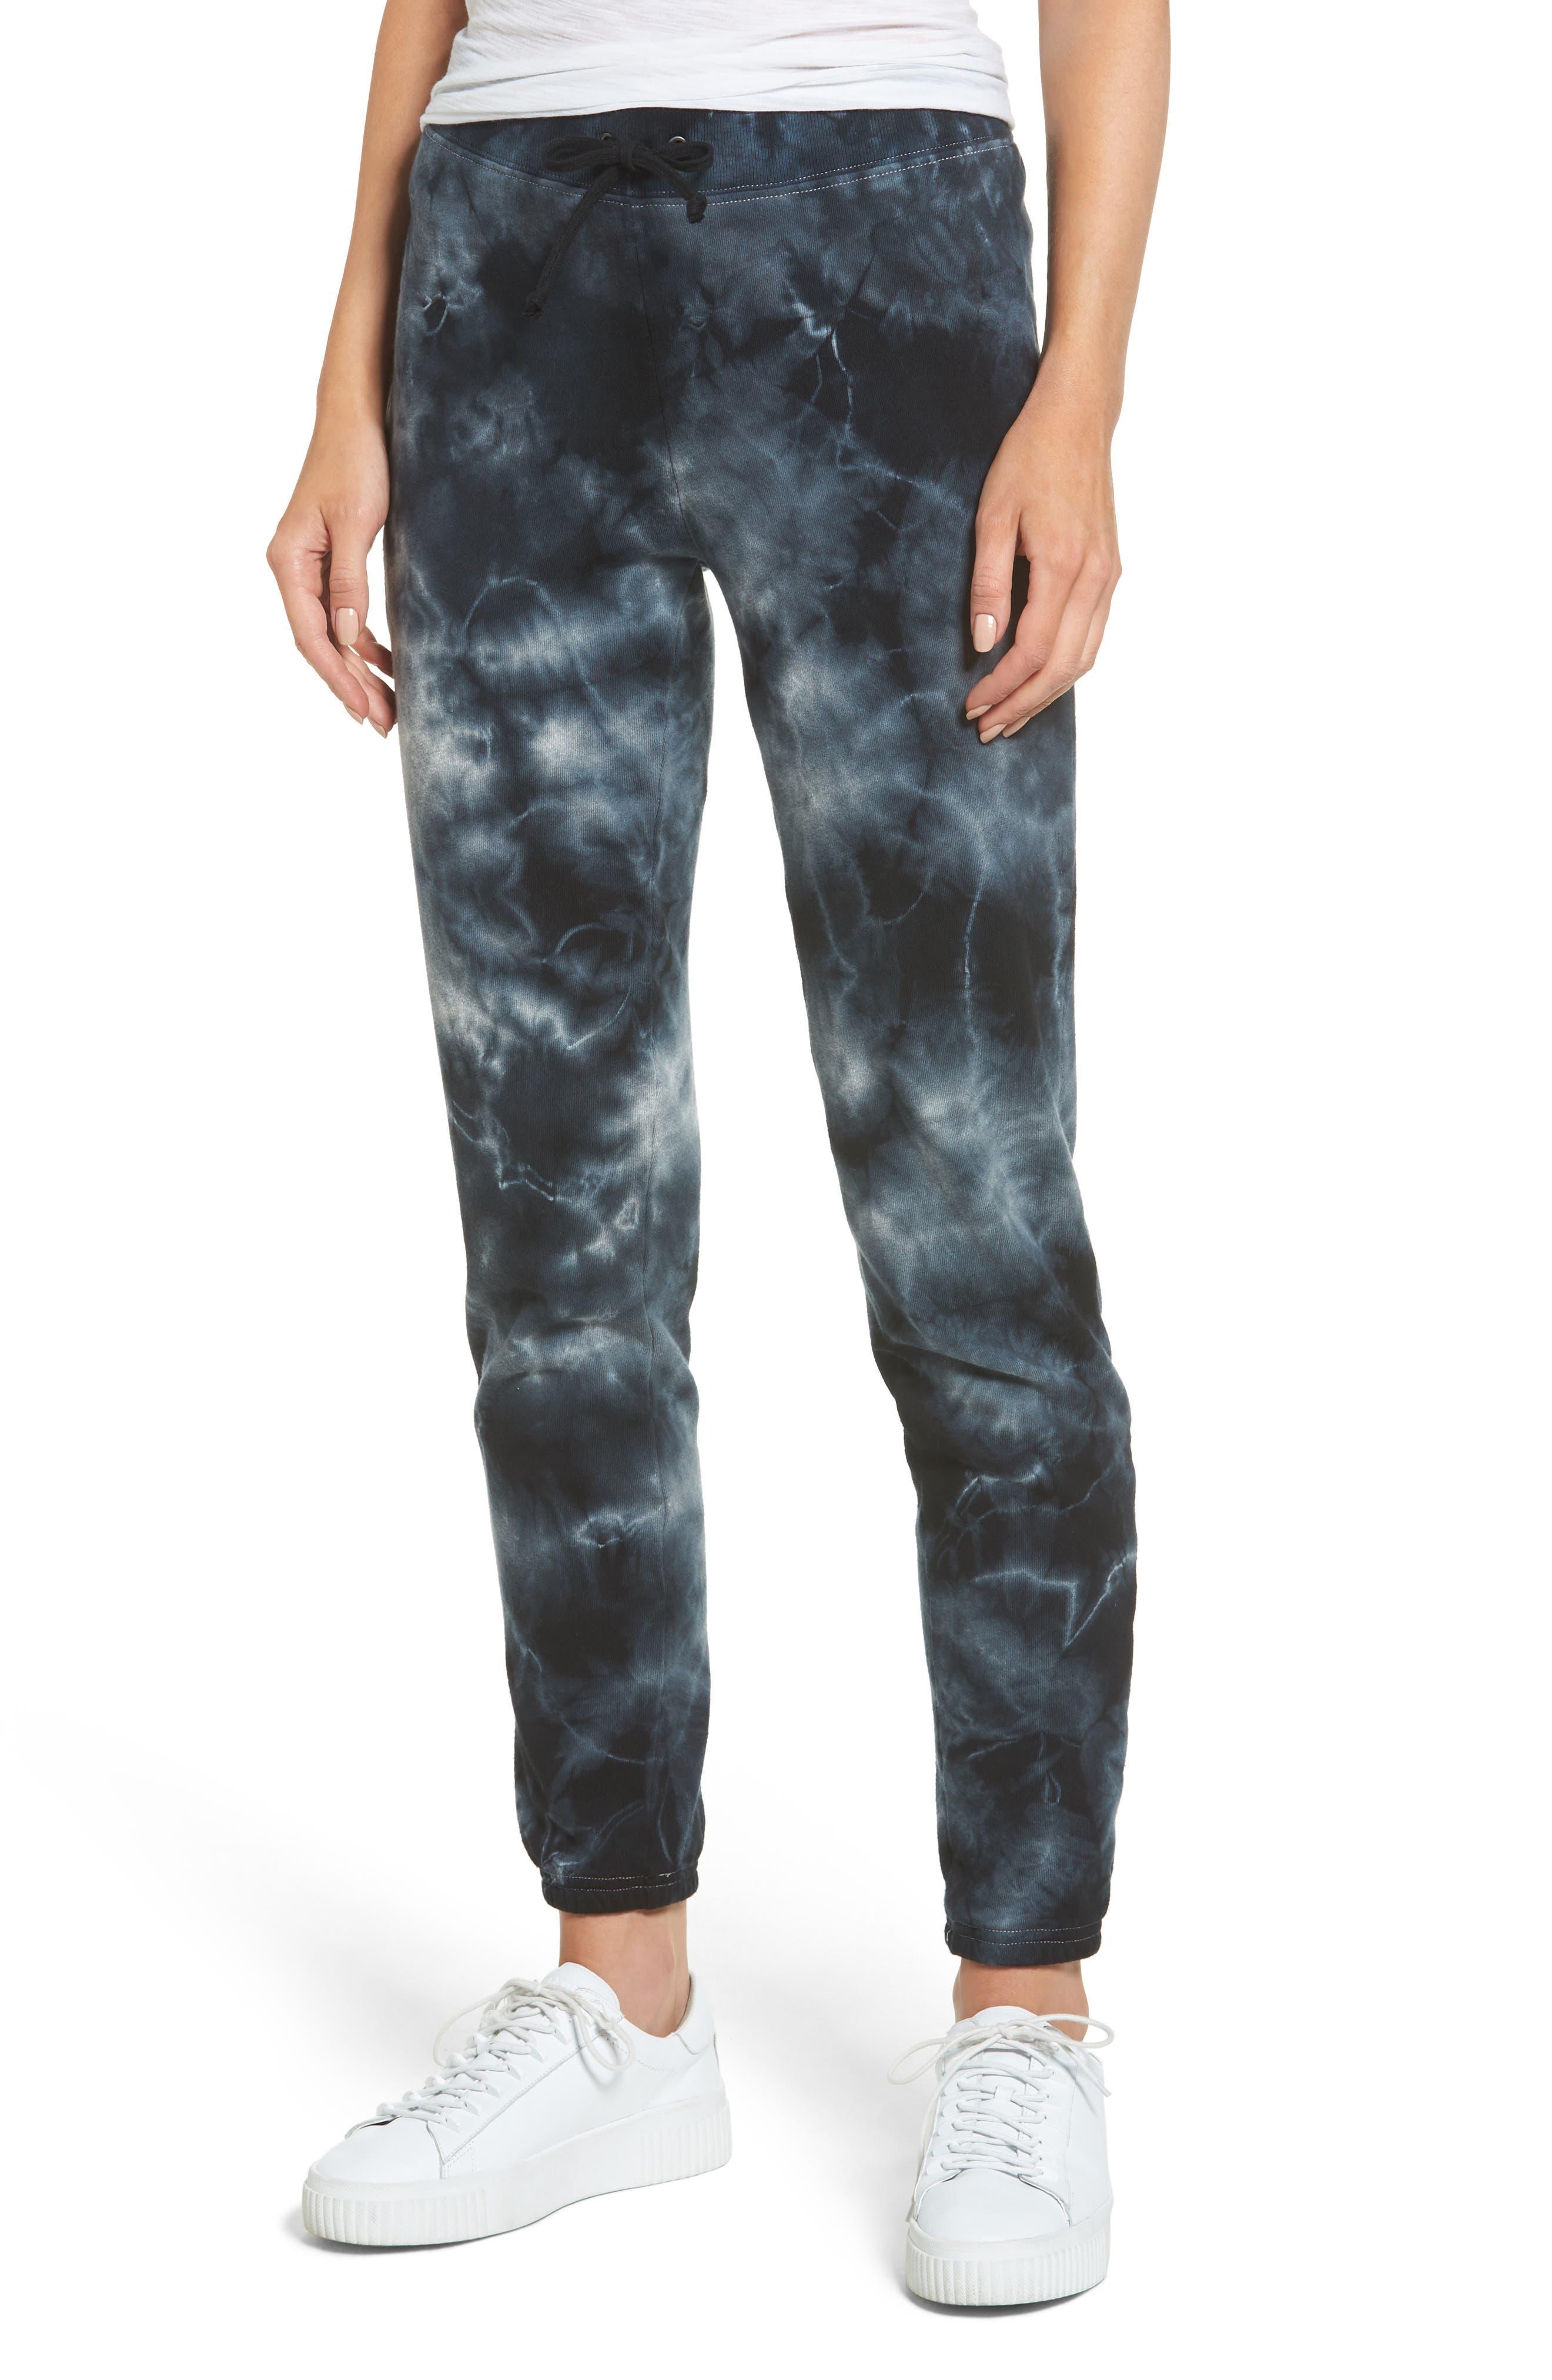 Tie Dye Knit Pants,                         Main,                         color, Black/ Heather Grey Tie Dye